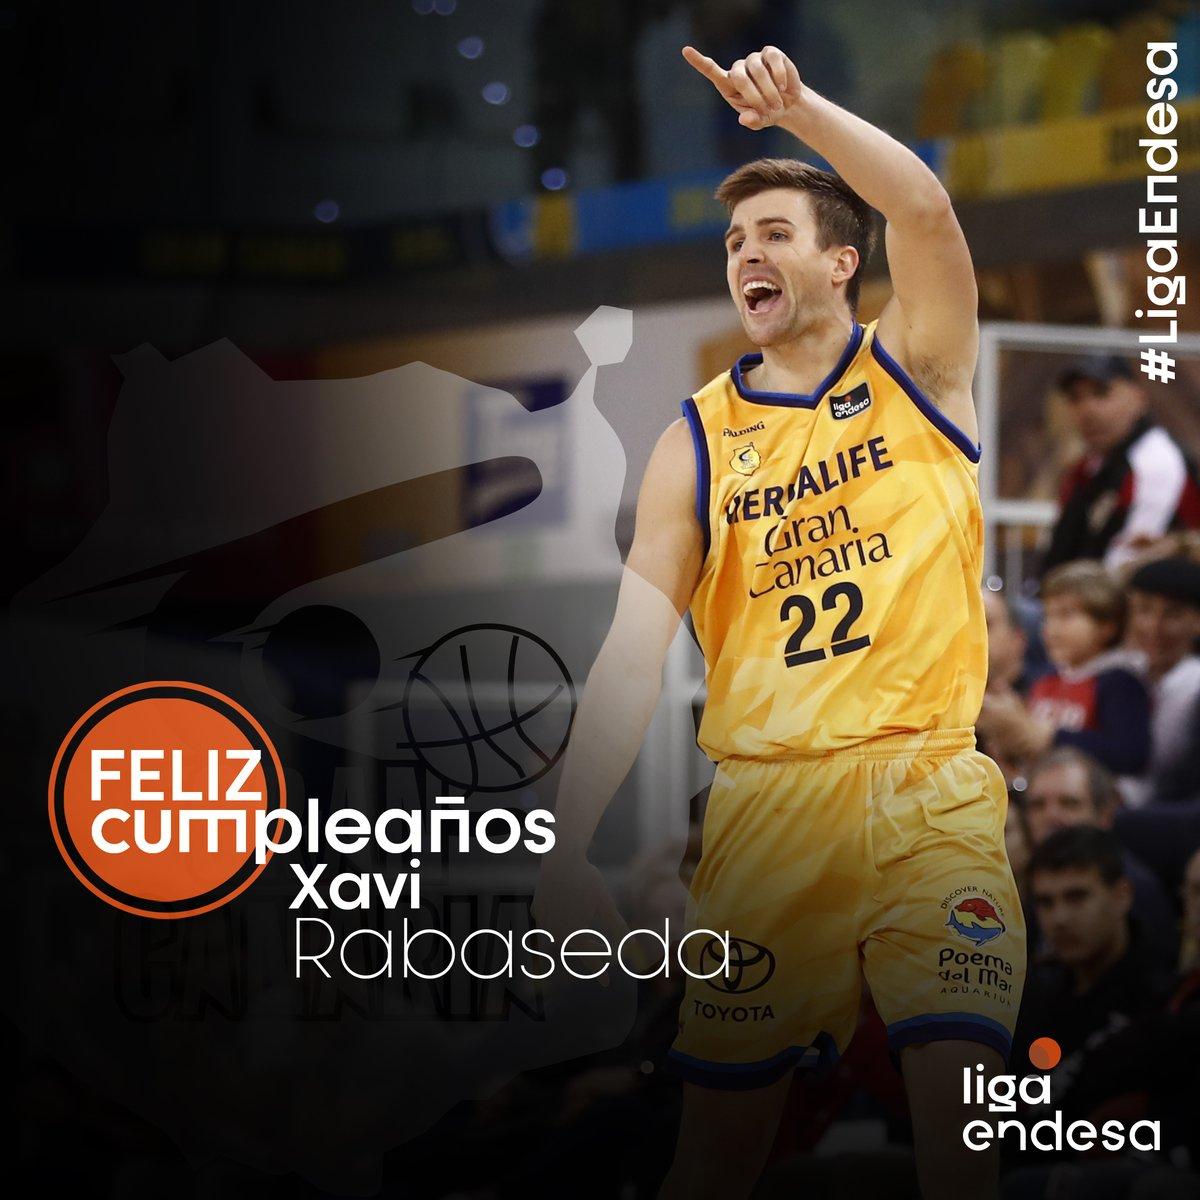 ¡Feliz cumpleaños, @xavirabaseda22! #LigaEndesa